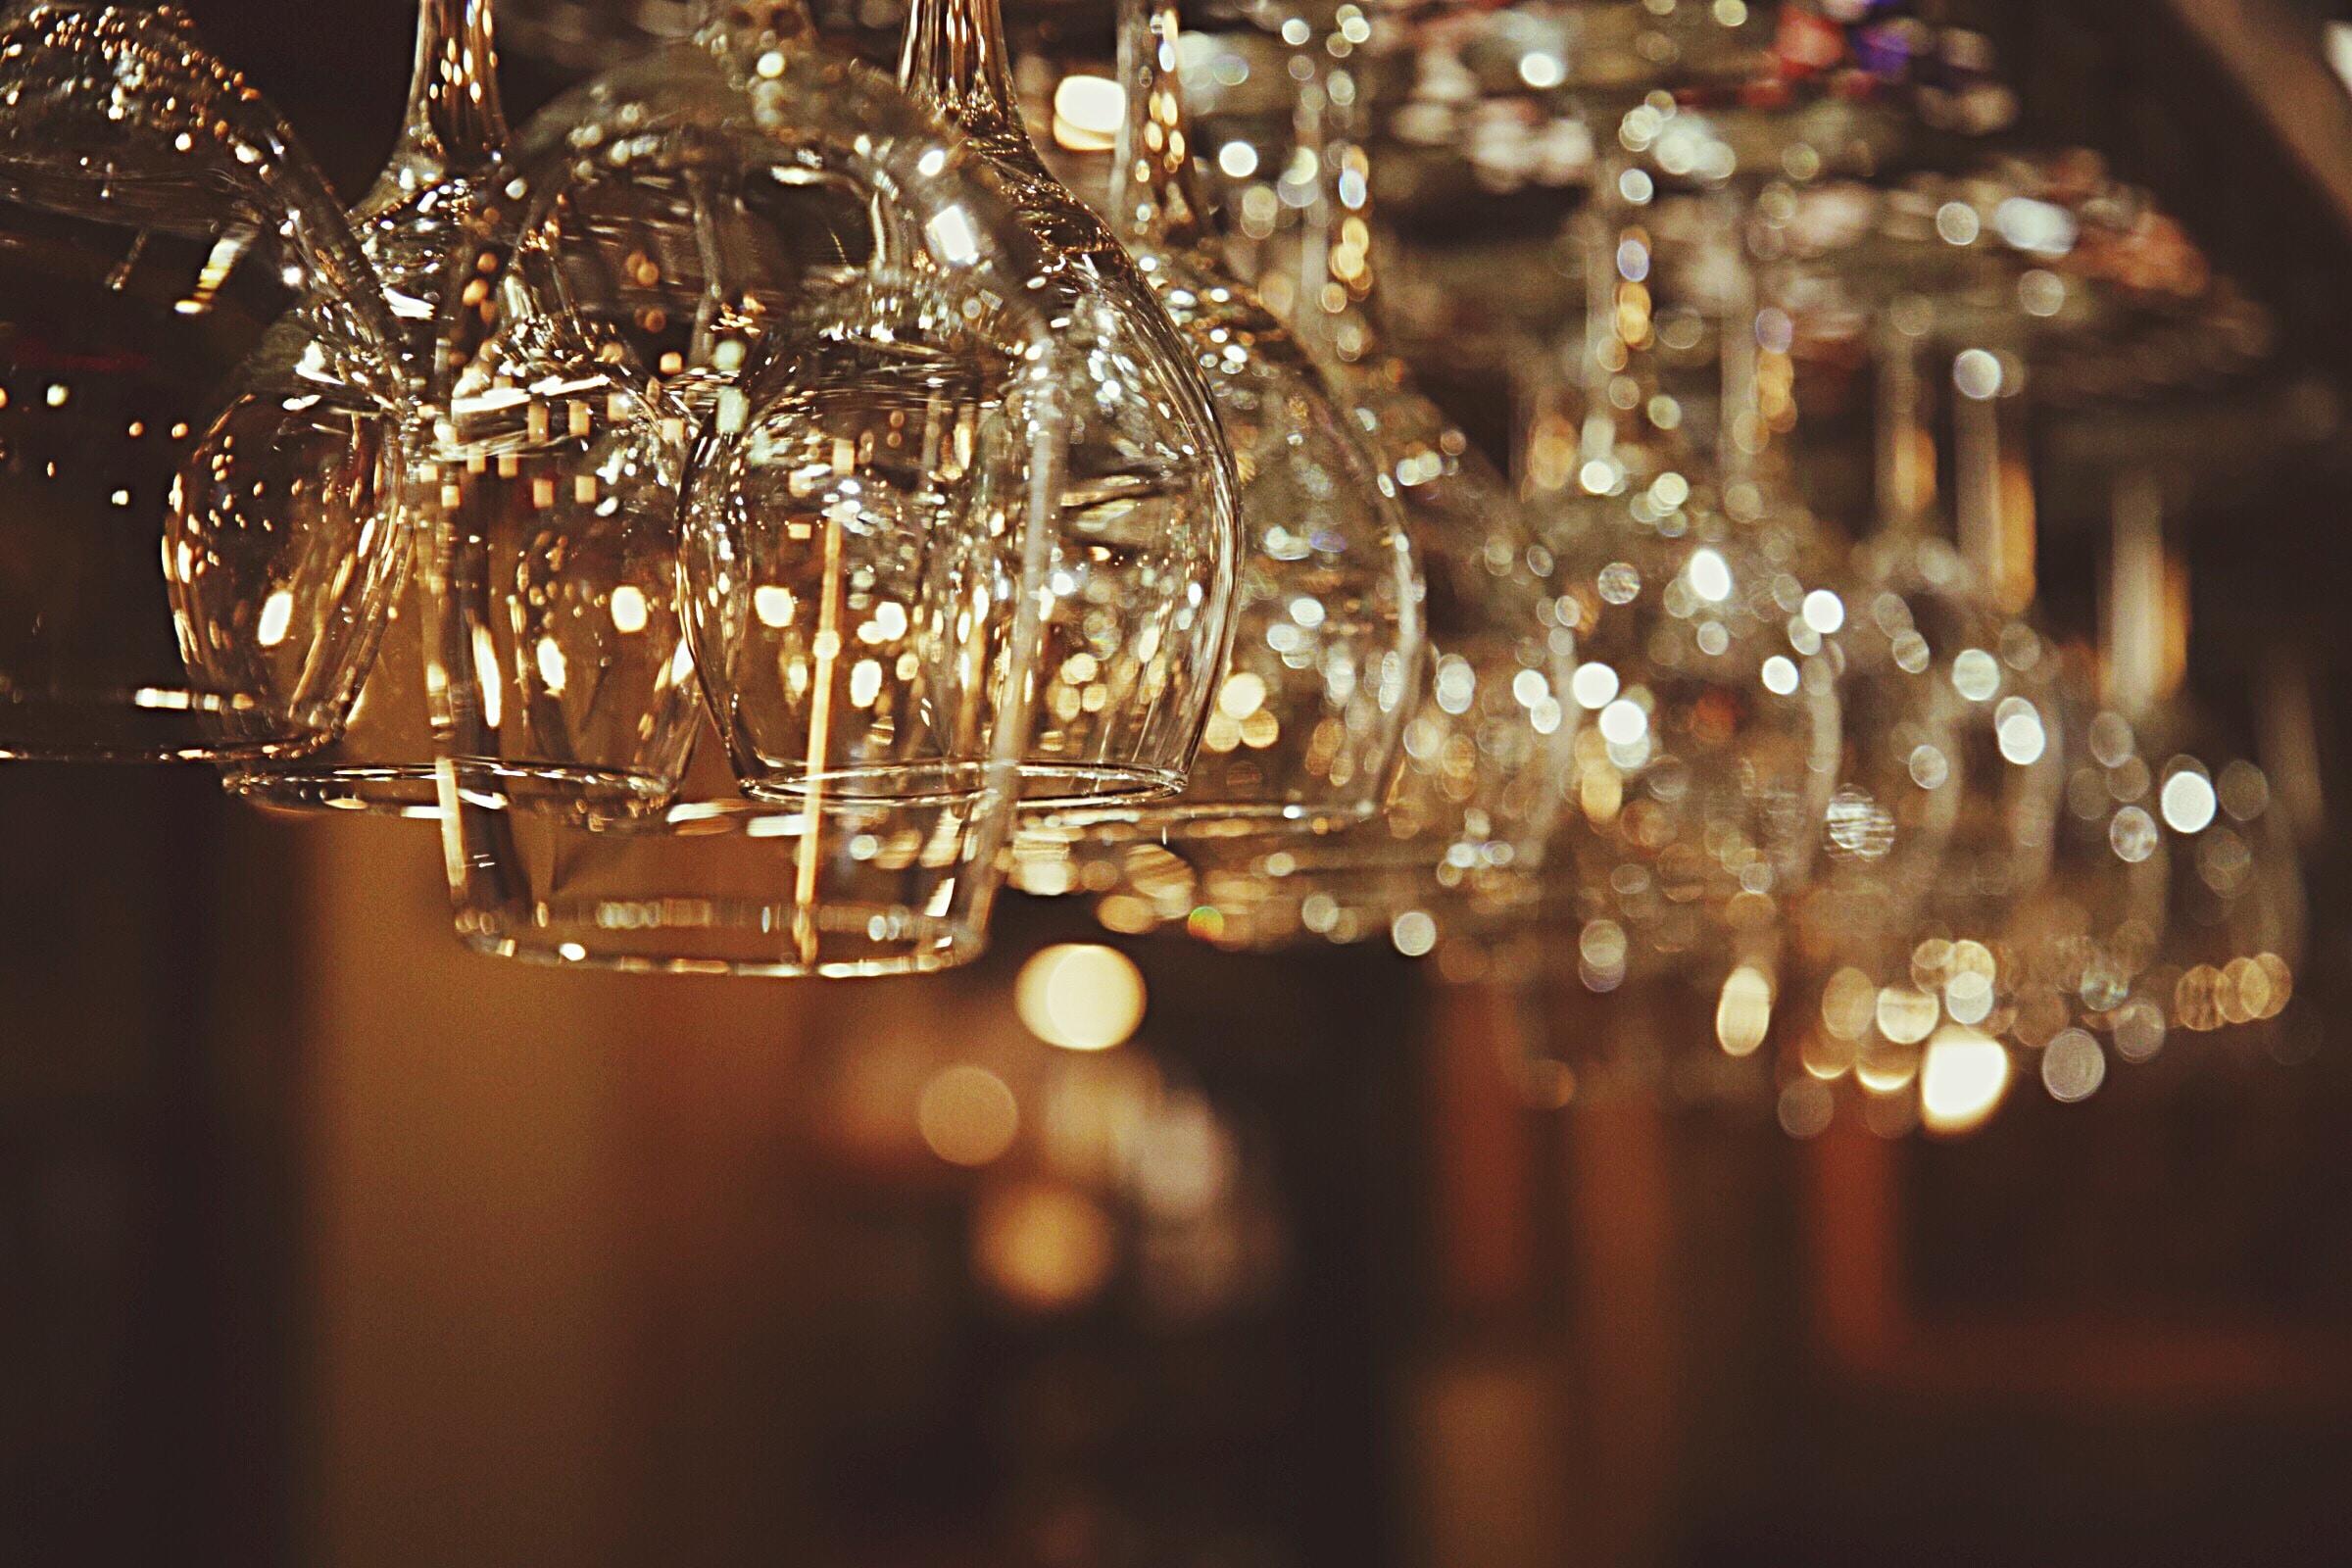 wine bar at home ideas